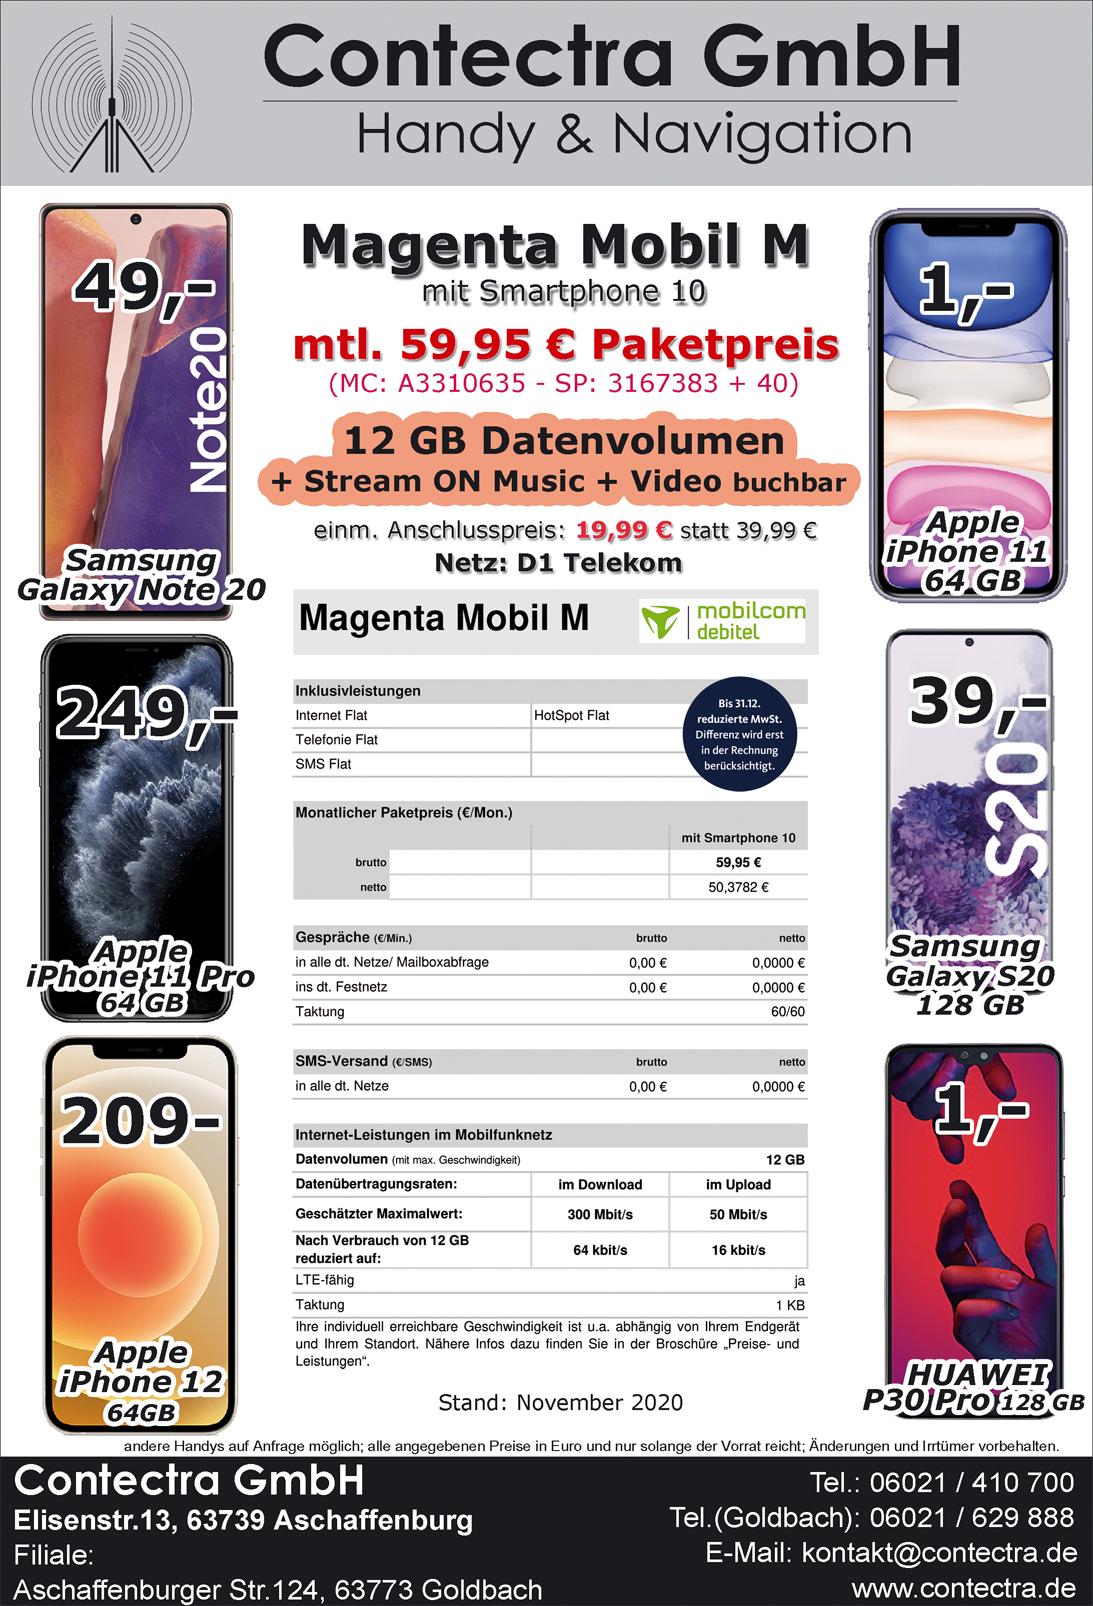 Magenta M H10 Nov 20 Kopie